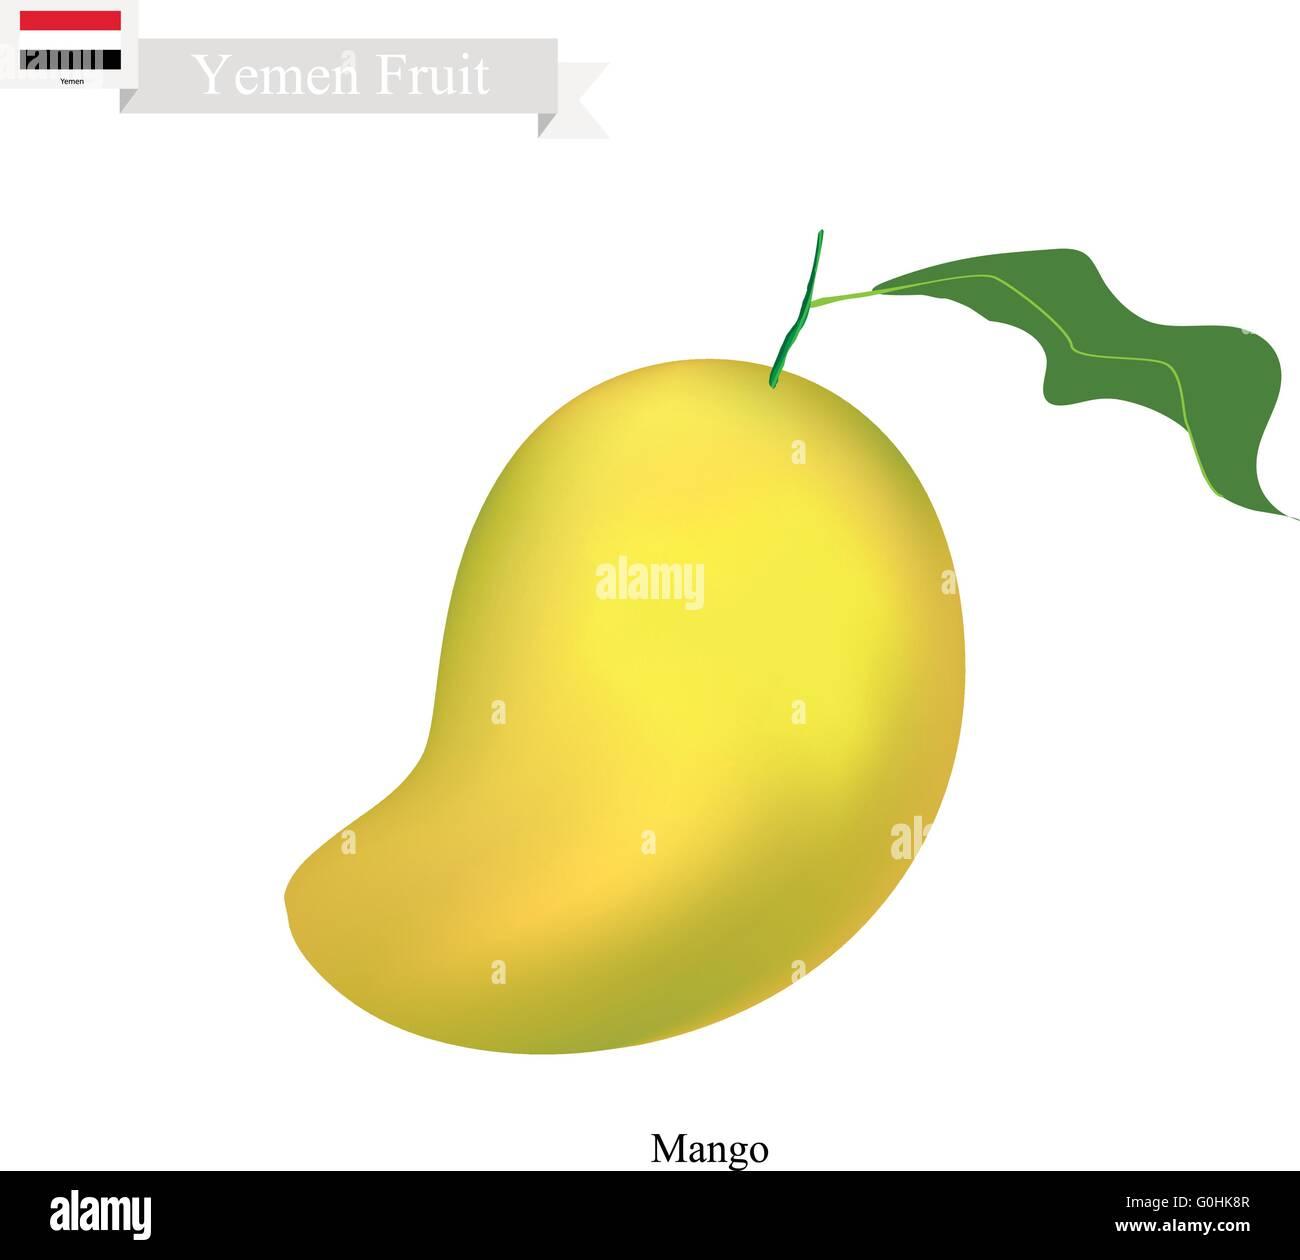 Yemen Fruit, Illustration of Mango. One of The Most Popular Fruits in Yemen. - Stock Vector